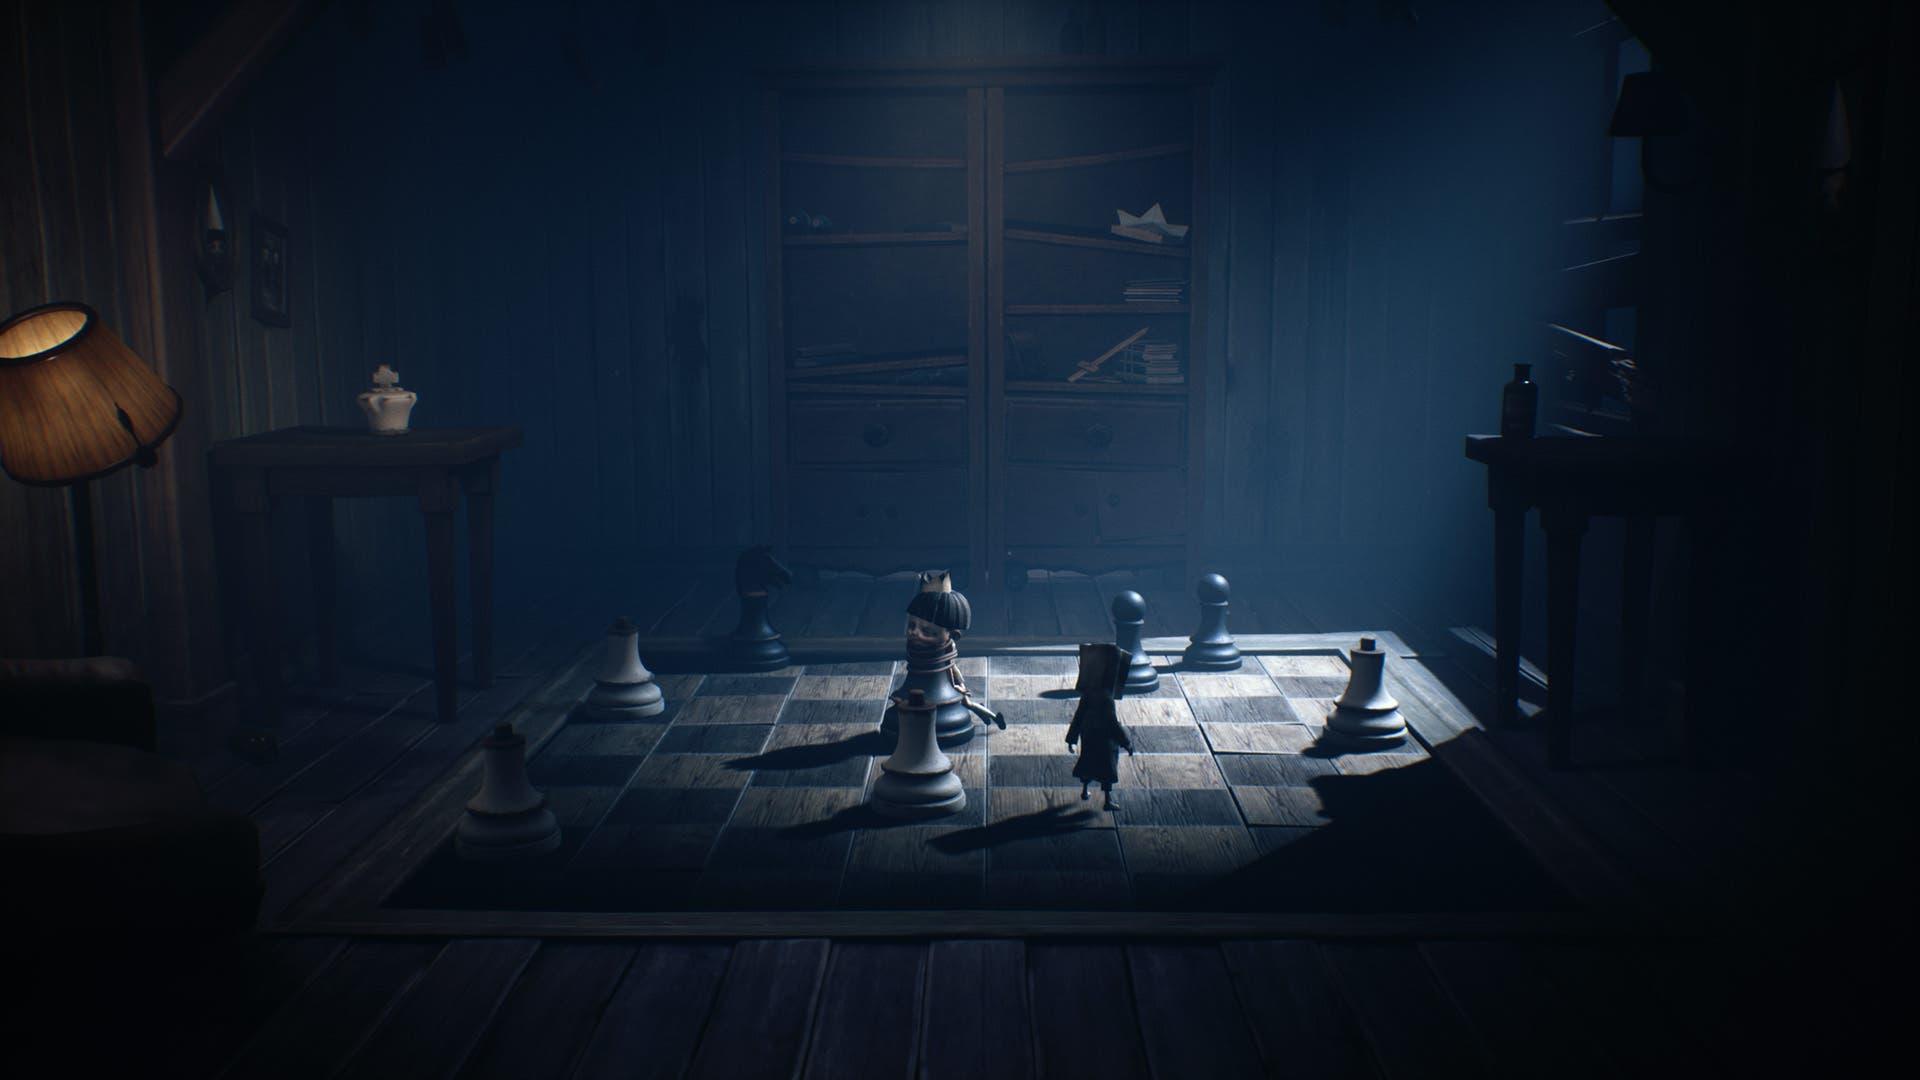 Análisis de Little Nightmares 2 - Xbox One 2